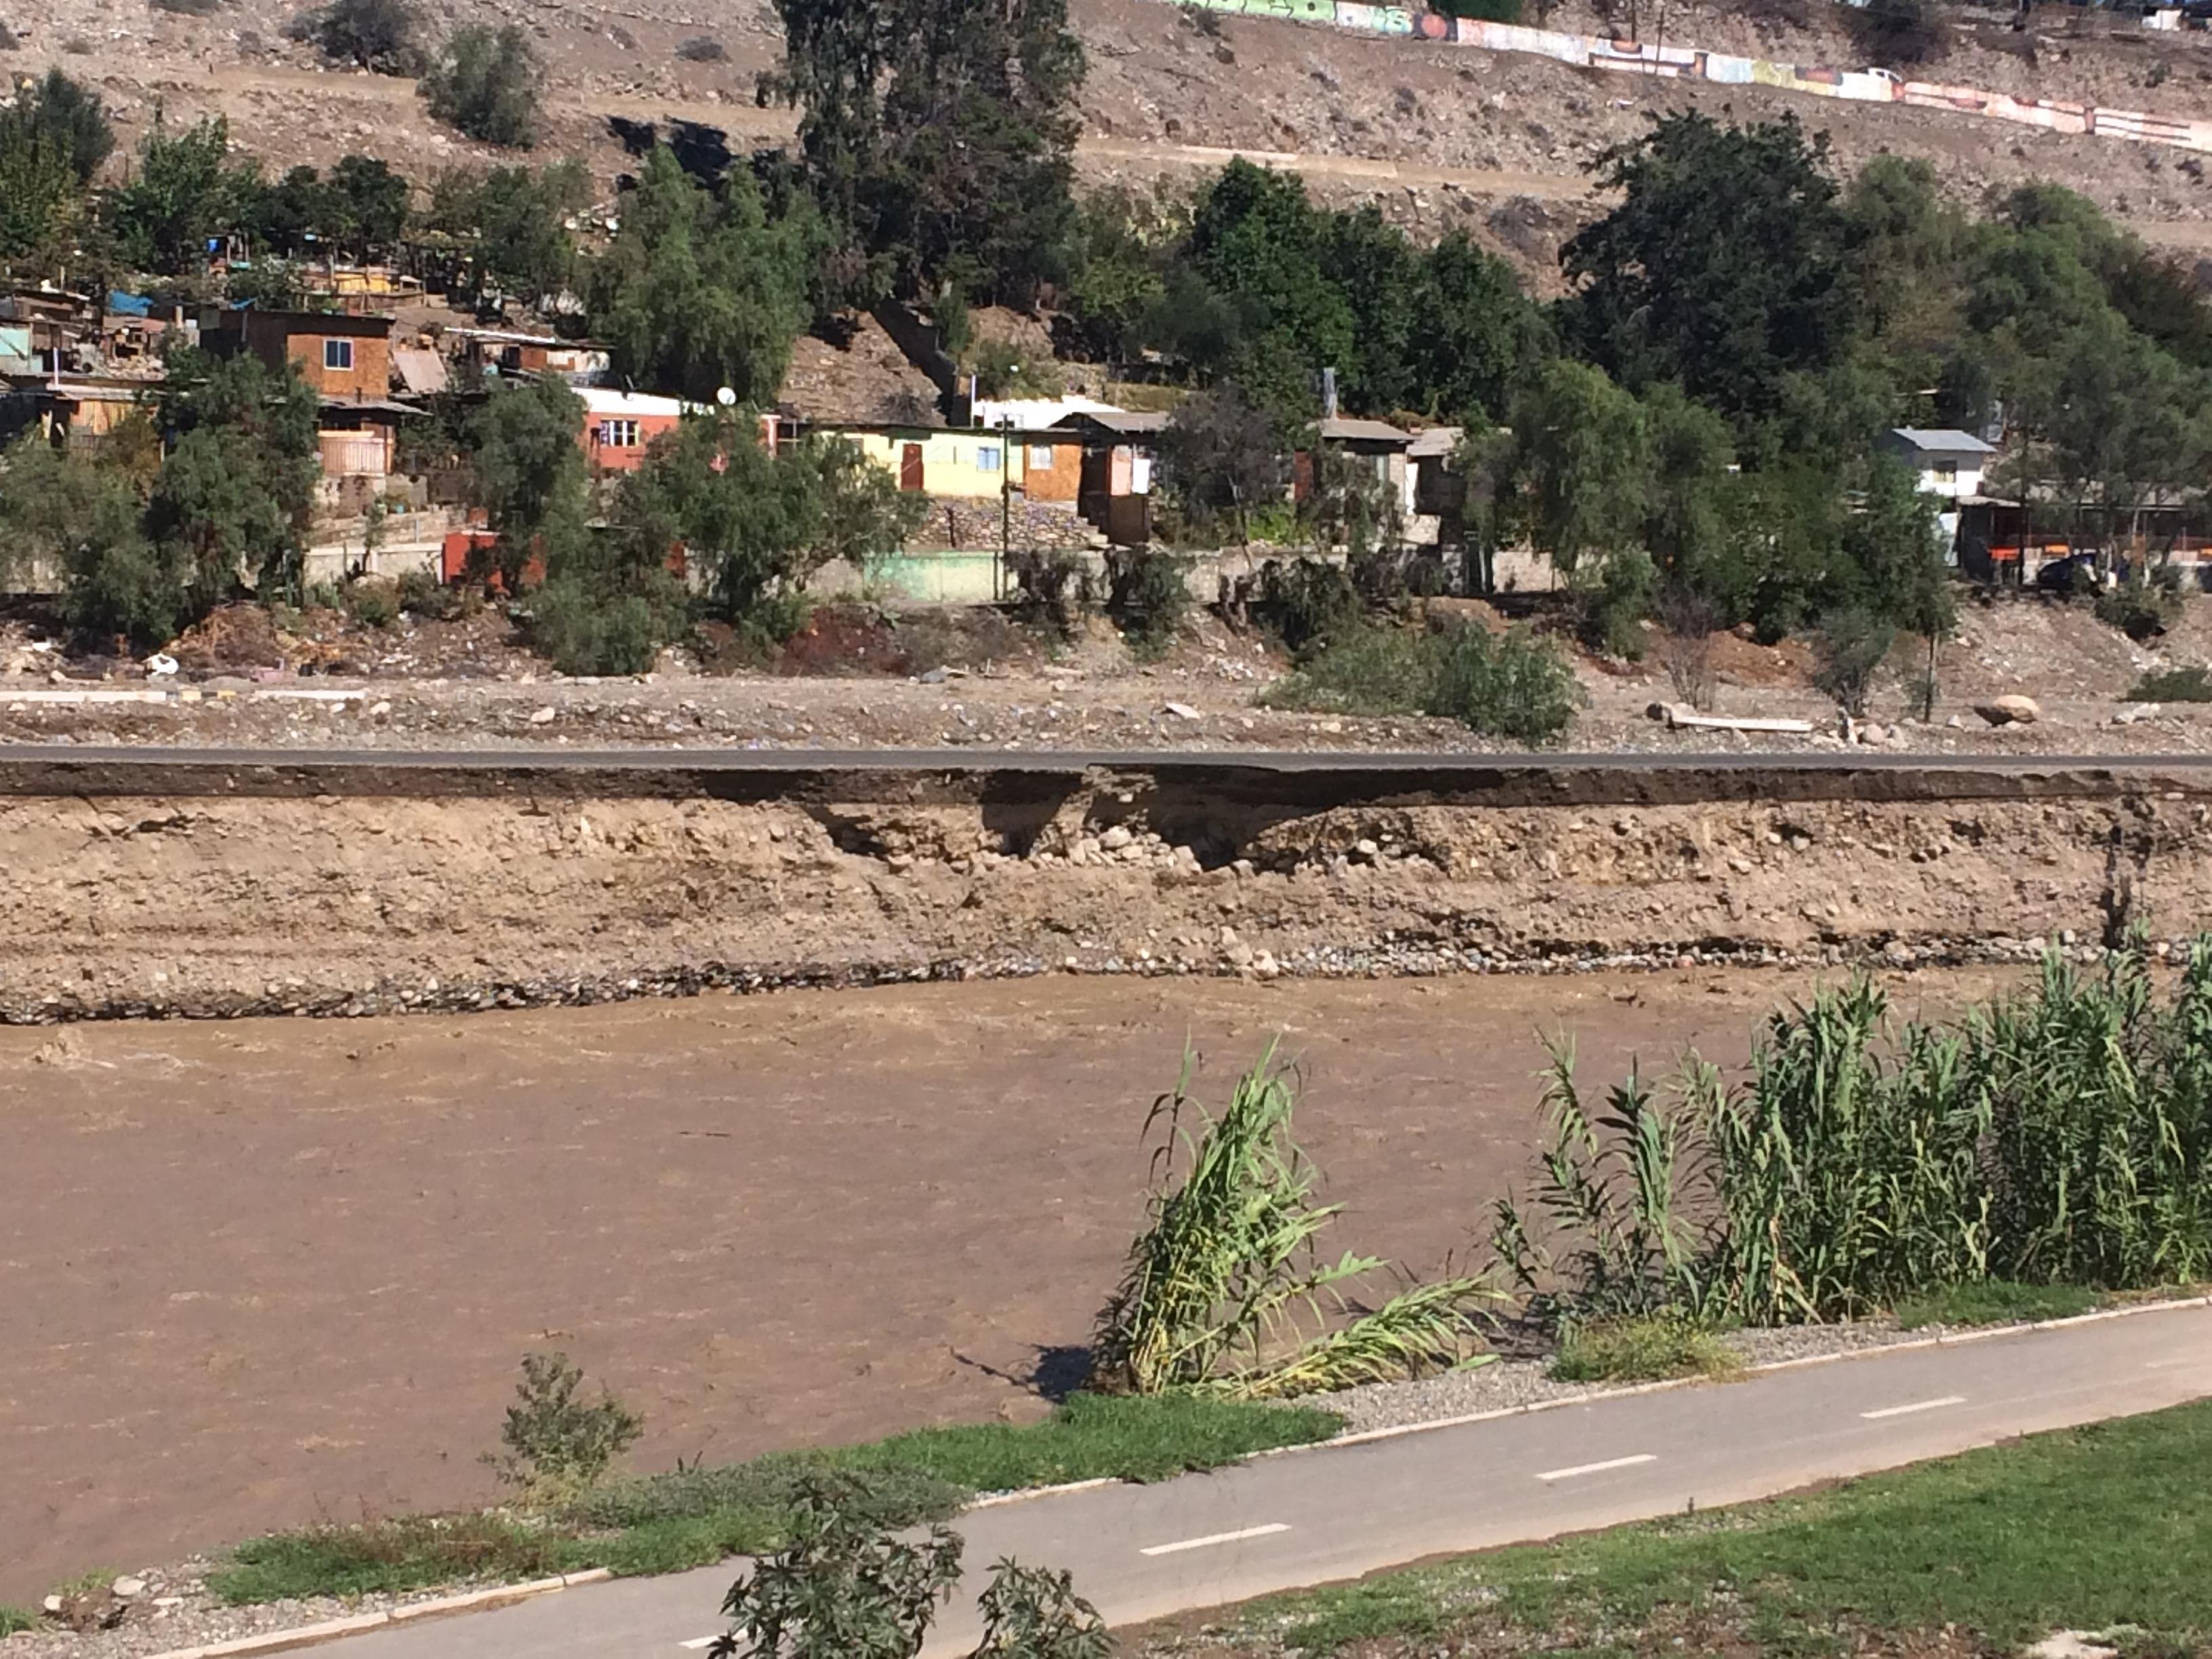 Solicitan no transitar por ribera sur de Vallenar: peligro de colapso por socavón en ruta